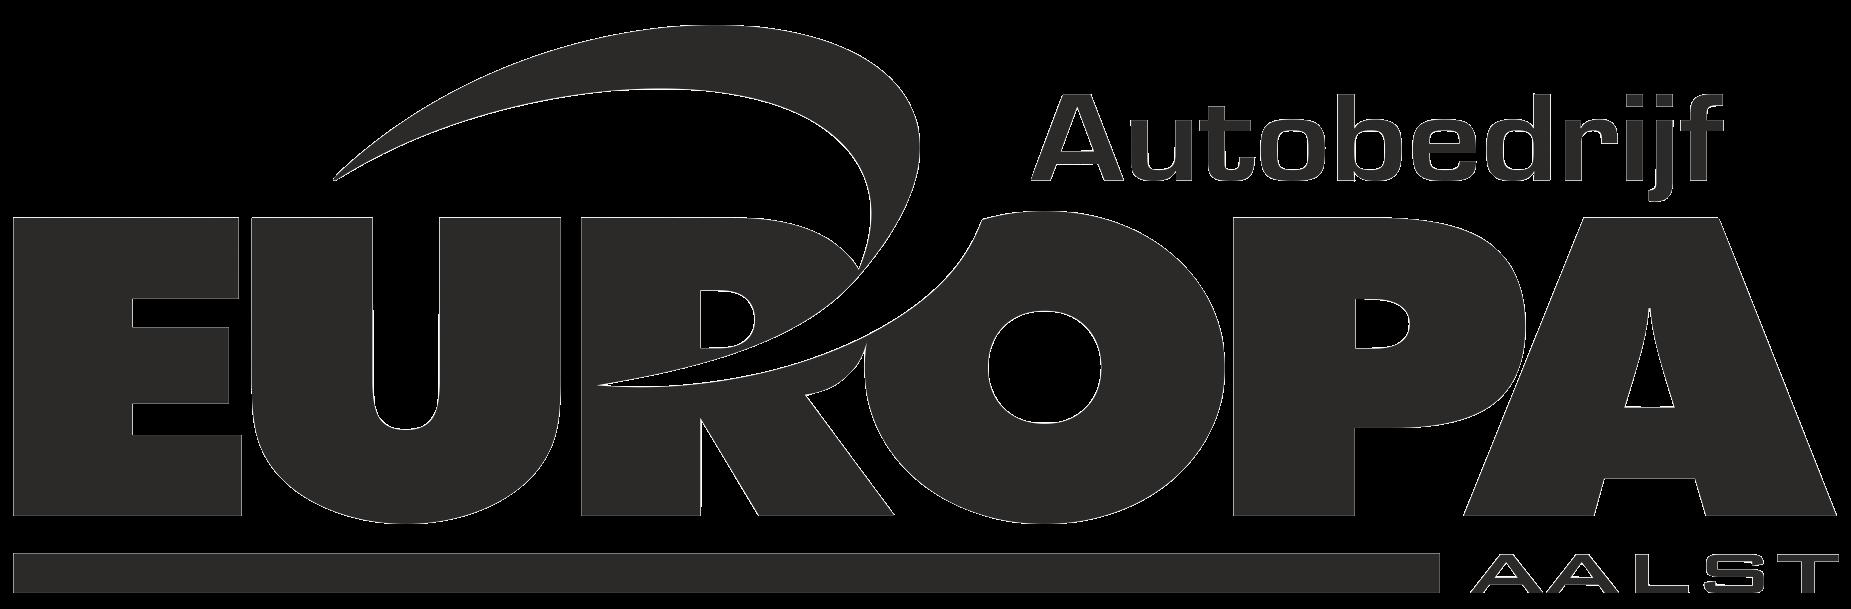 Autobedrijf Europa Kia En Suzuki Dealer Aalst Inforegio Be